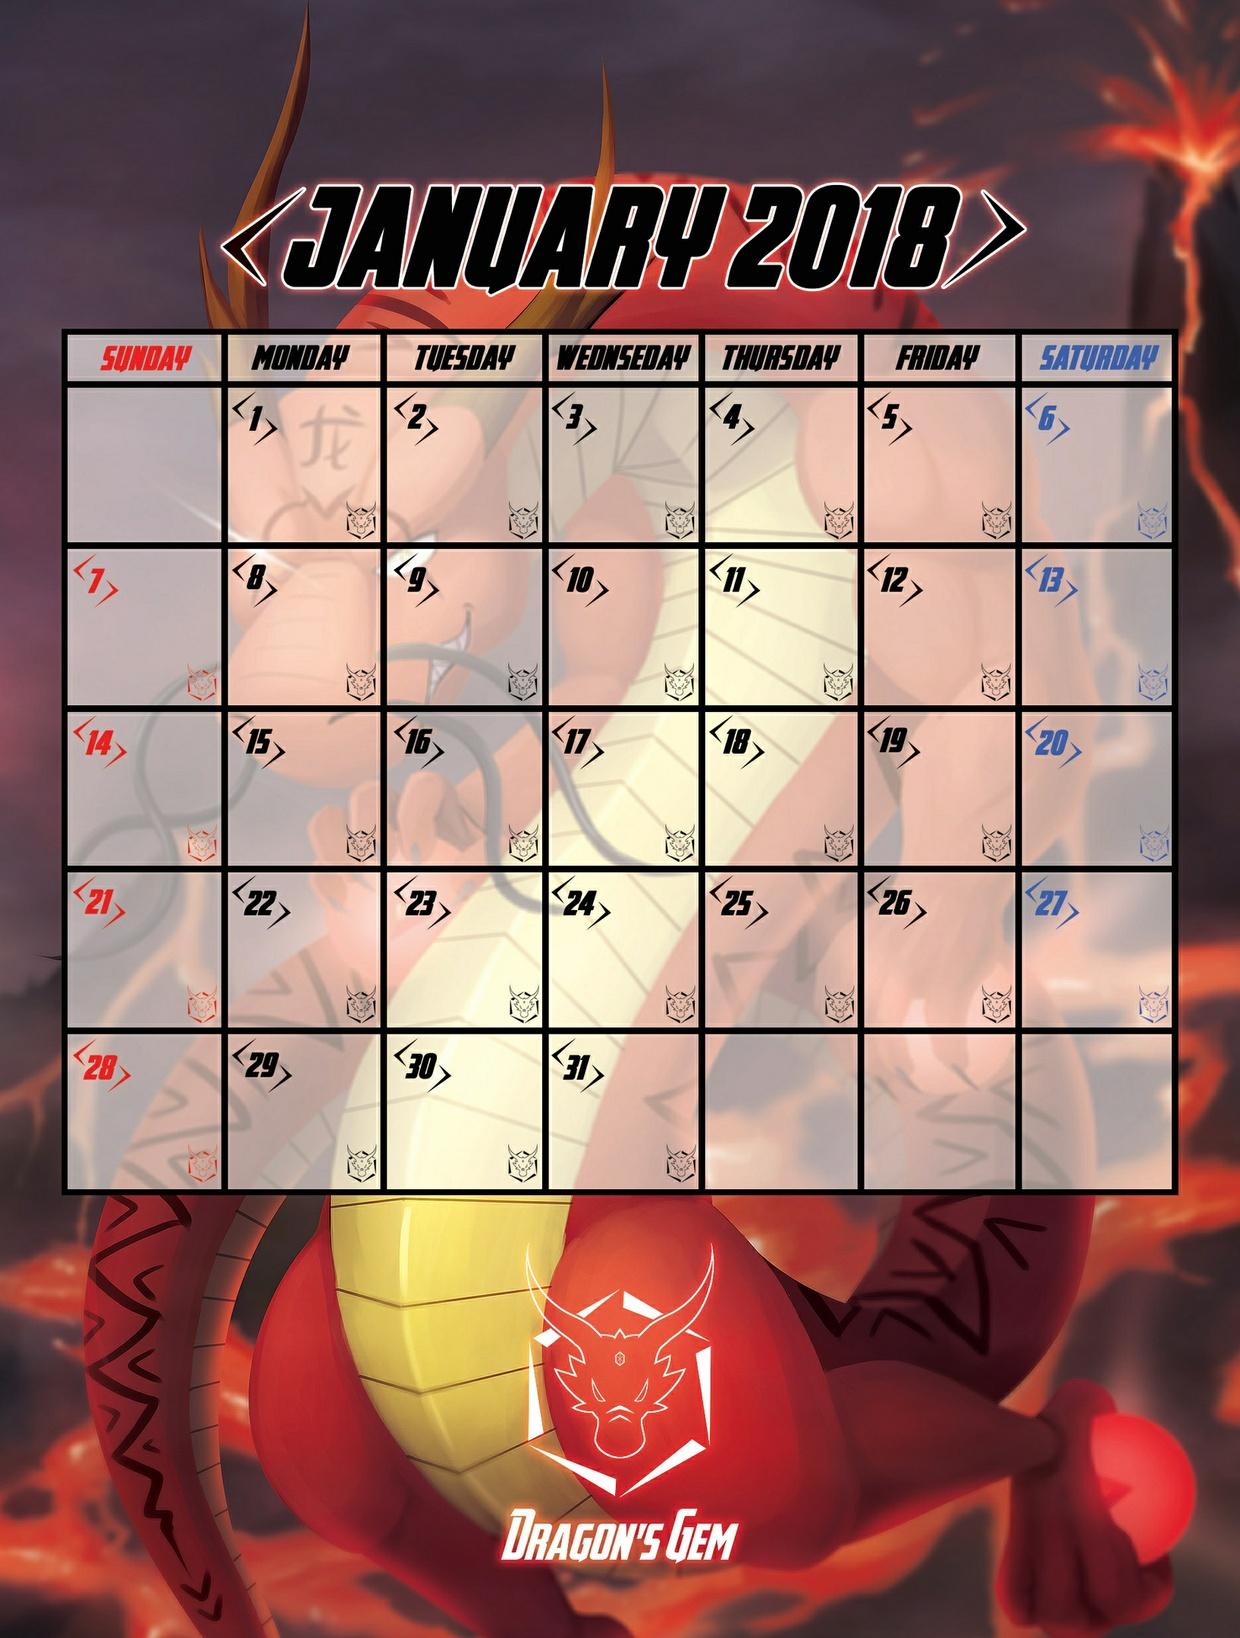 Calendar 2018 Artpack - Dragon's Gem [Digital files]